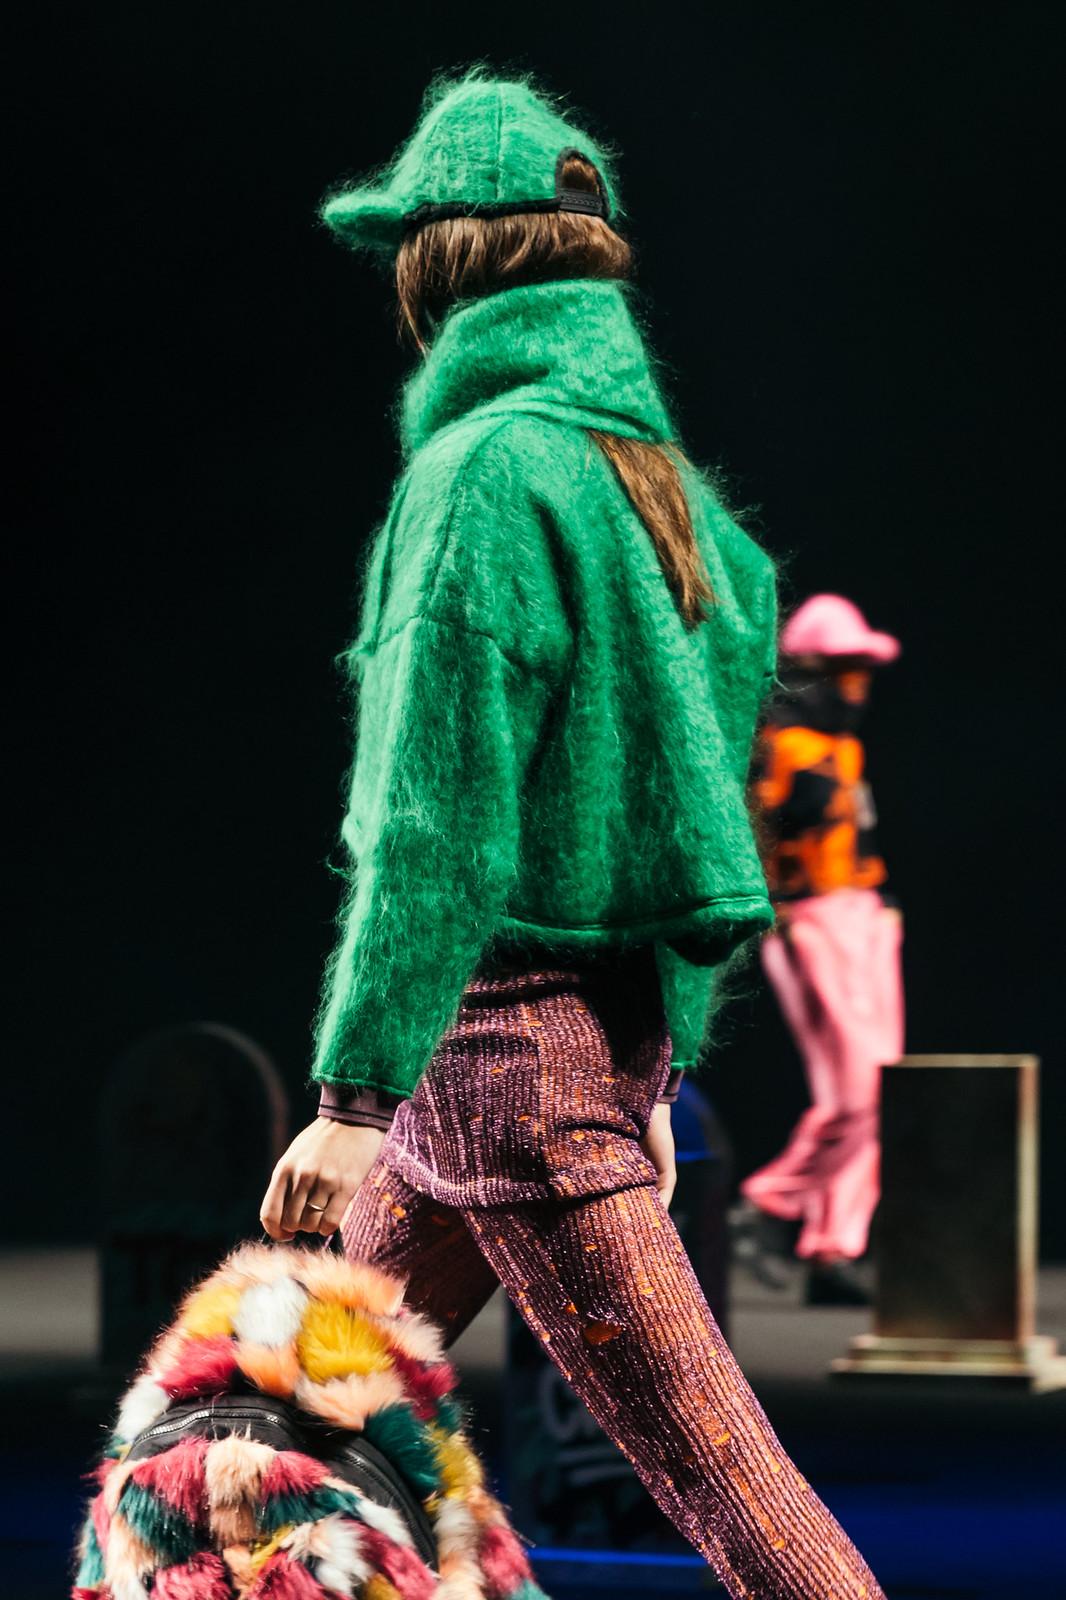 Jessie Chanes - Seams for a desire - 080 Bacelona Fashion #080bcnfasion -52